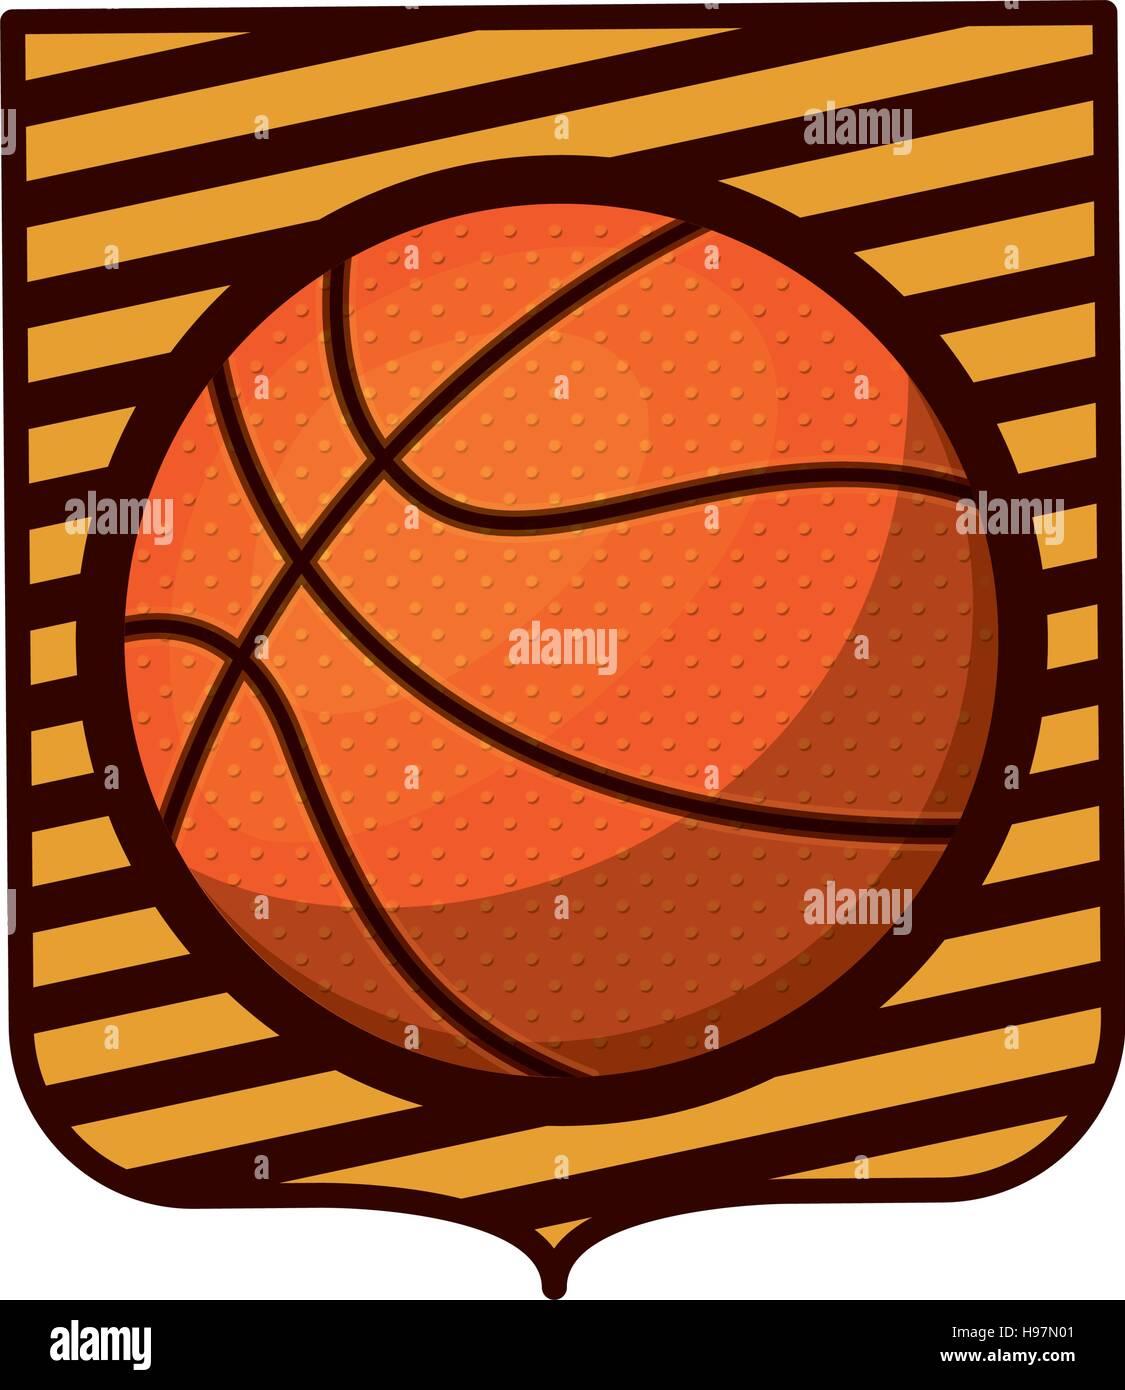 Basketball Tournament Emblem Ball Stockfotos & Basketball Tournament ...